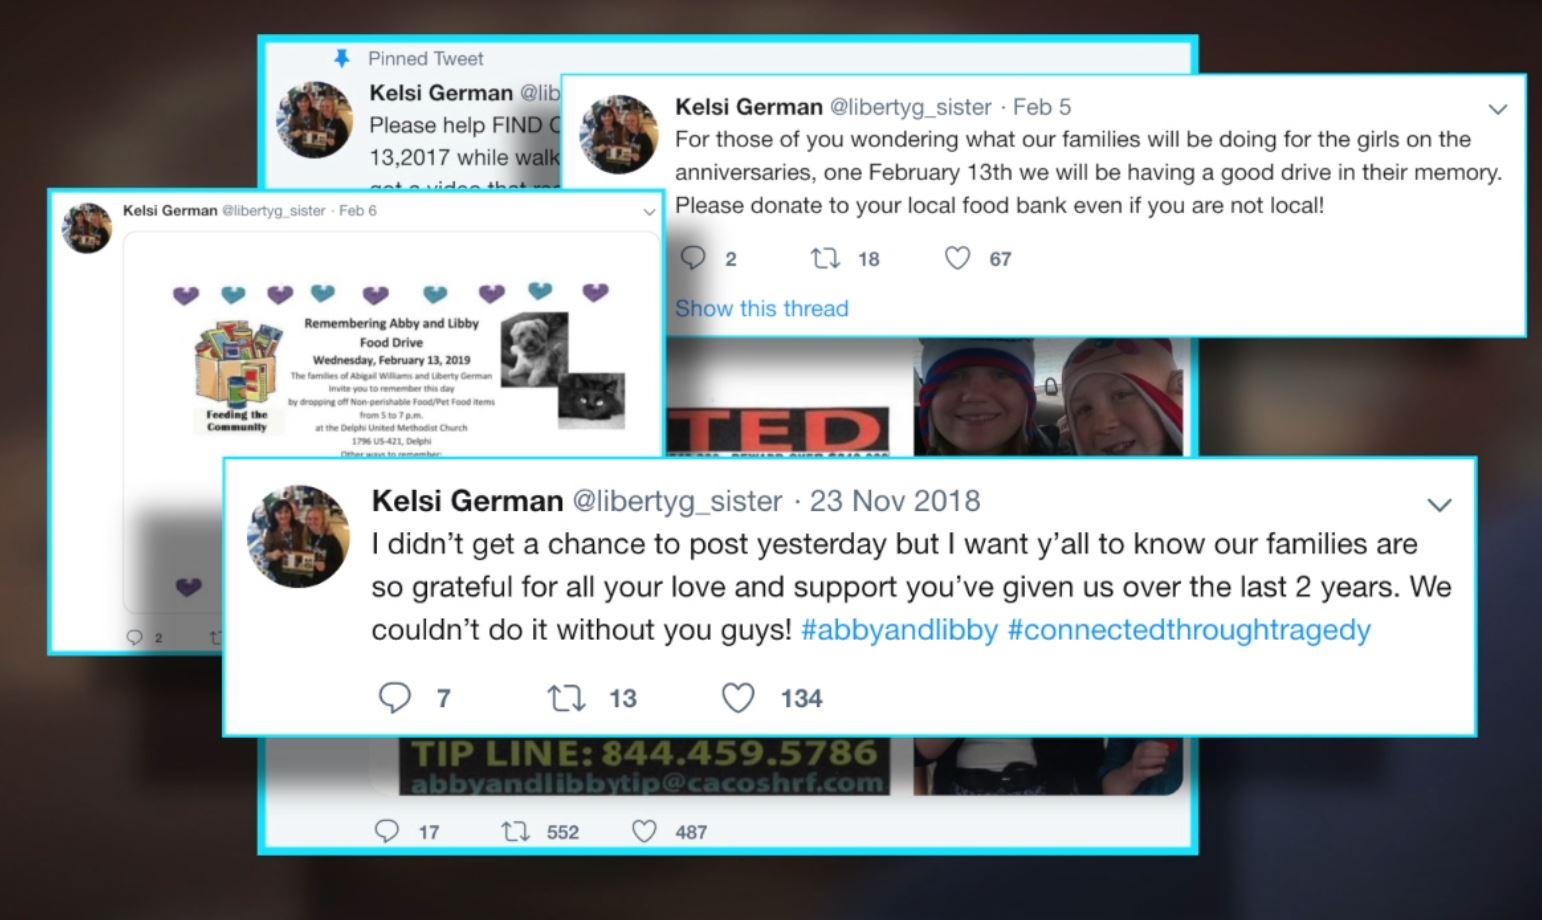 Kelsi's Mission: Sister of Delphi murder victim hopes Twitter will